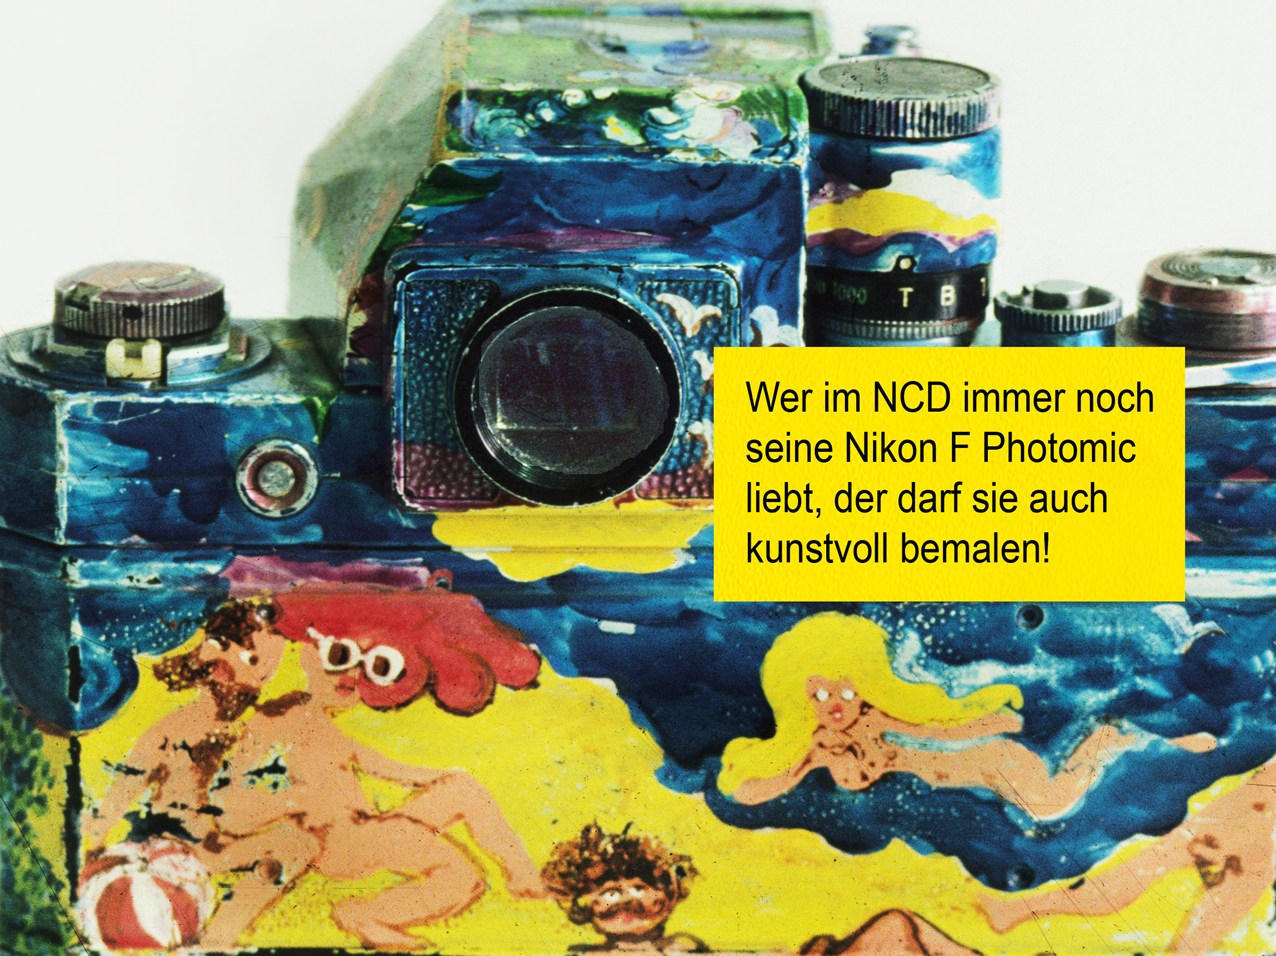 NCD Rückblick